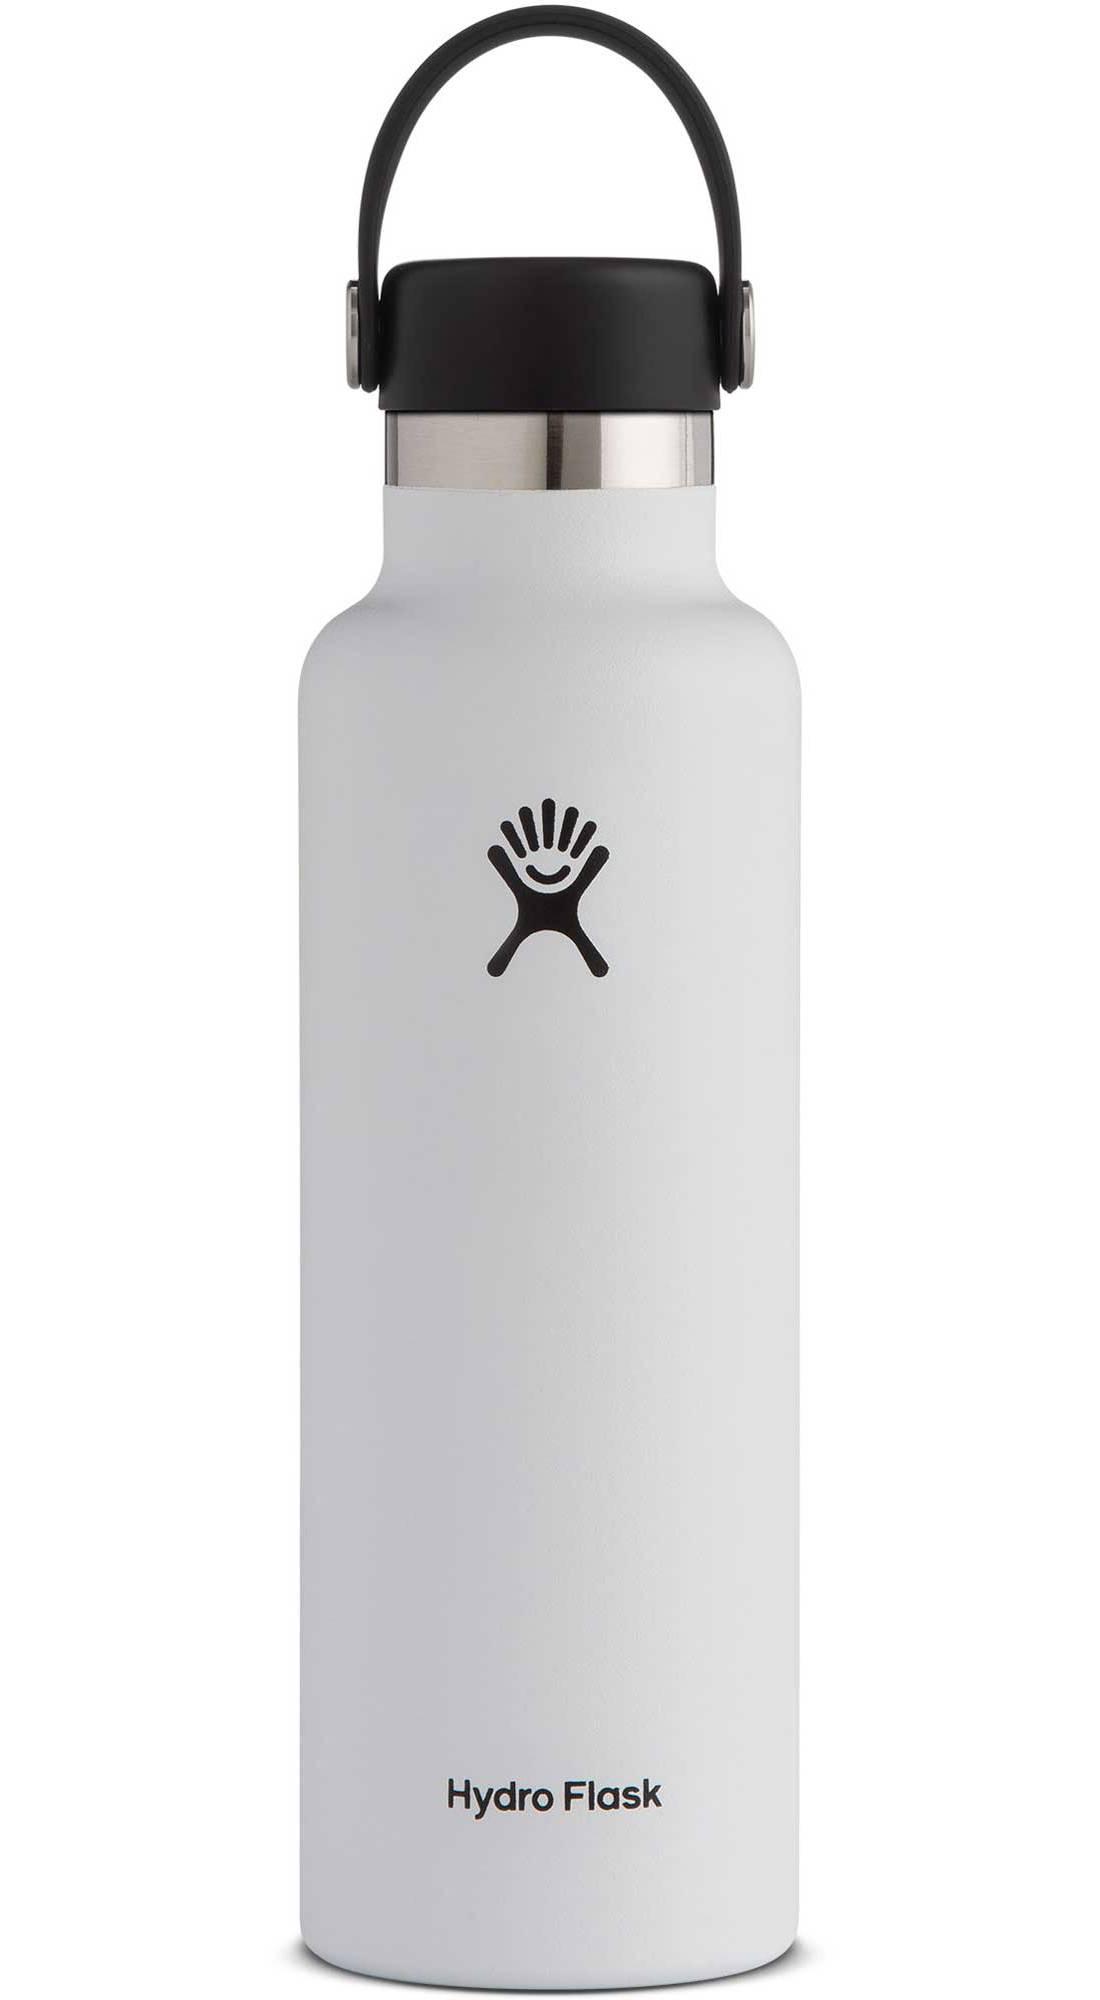 Hydro Flask 21 Ounce Standard Mouth Bottle